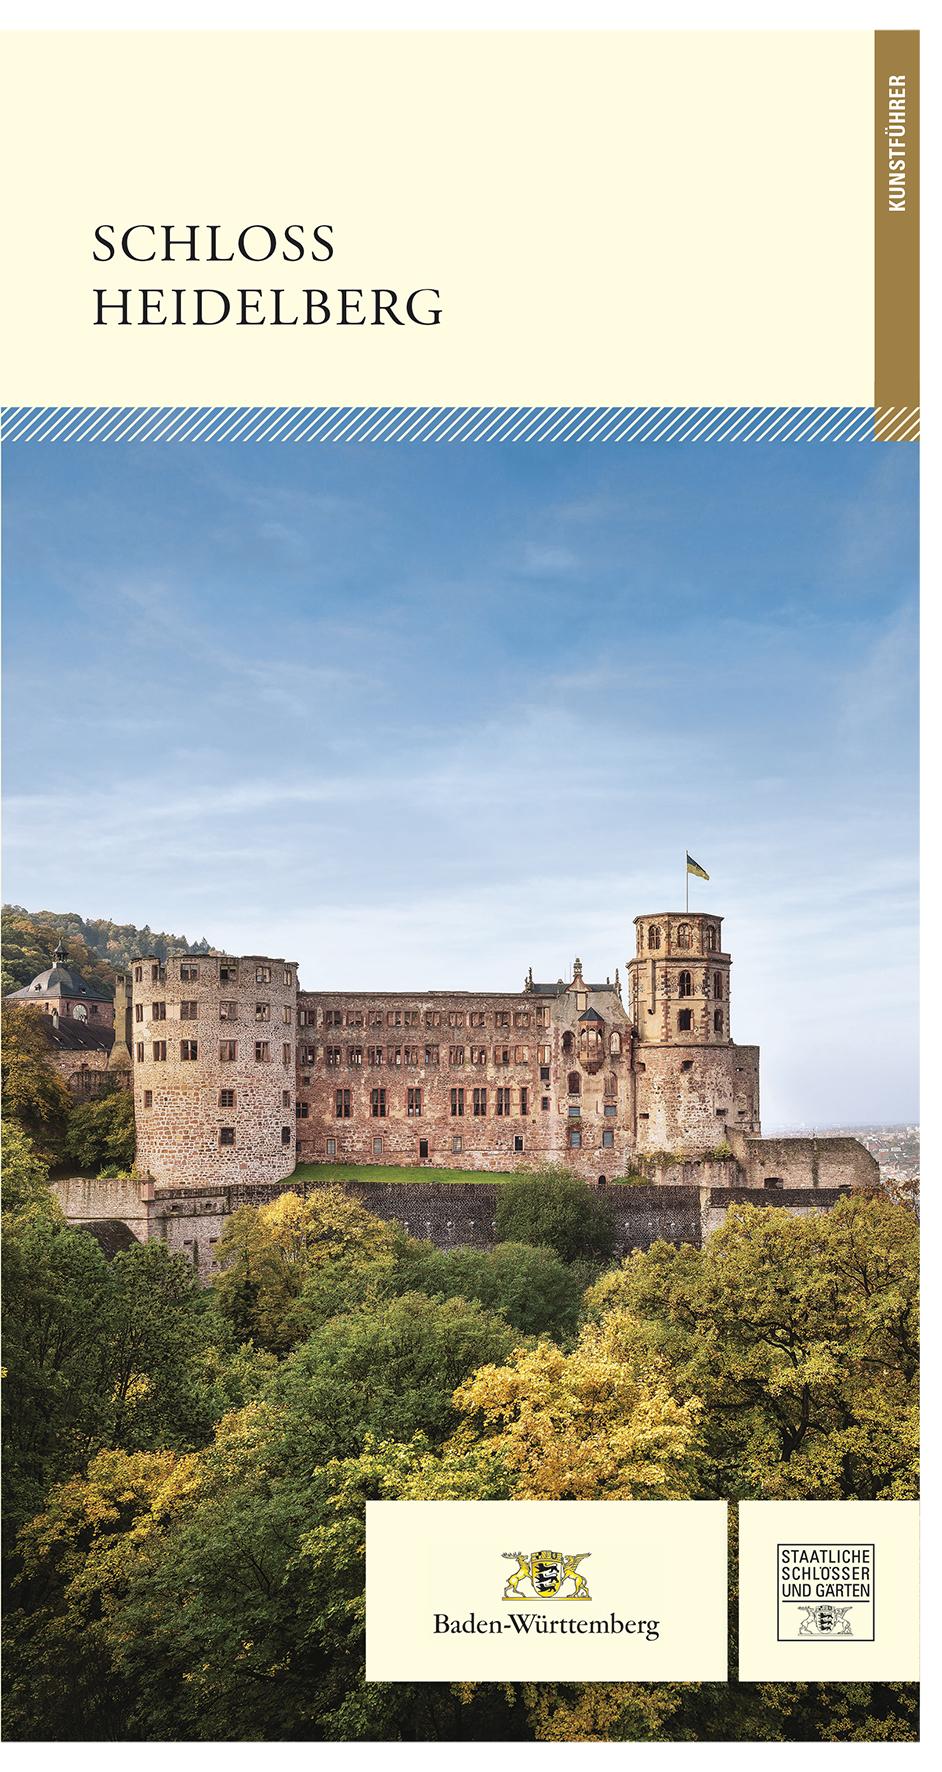 Schloss Heidelberg_Umschlag_aktuell.qxp_Layout 1